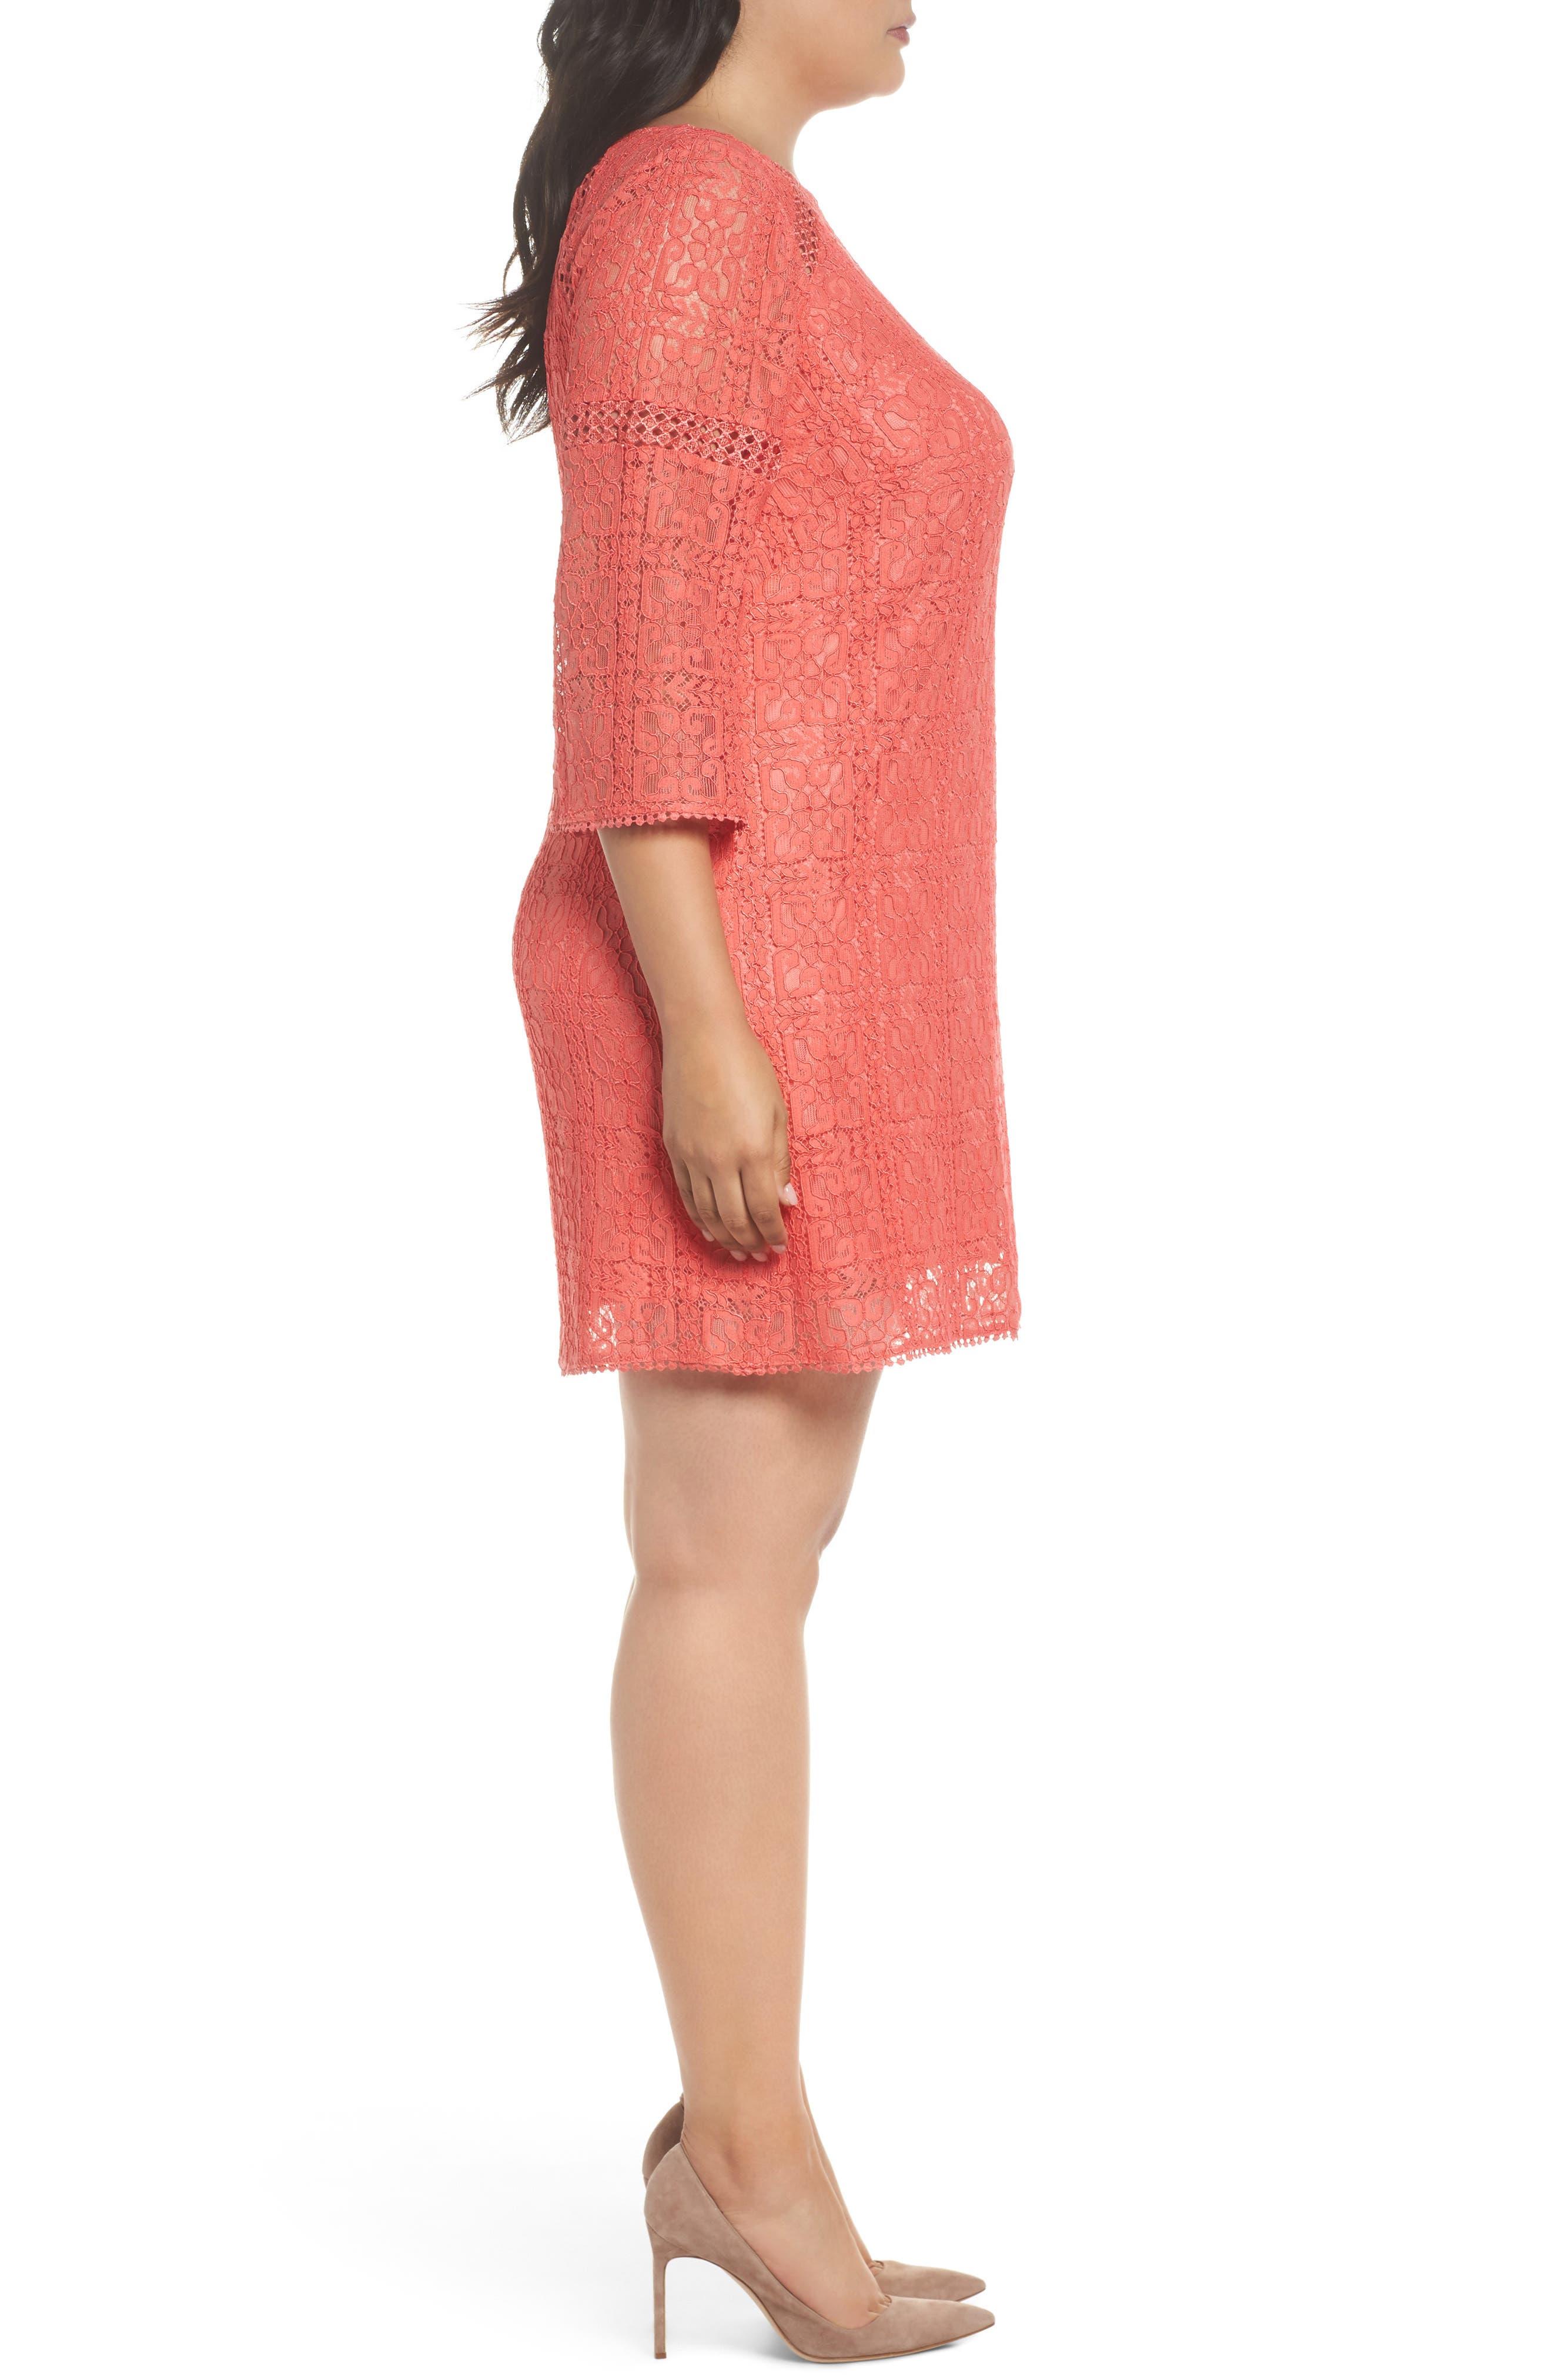 Marni Lace Shift Dress,                             Alternate thumbnail 3, color,                             Cruise Coral